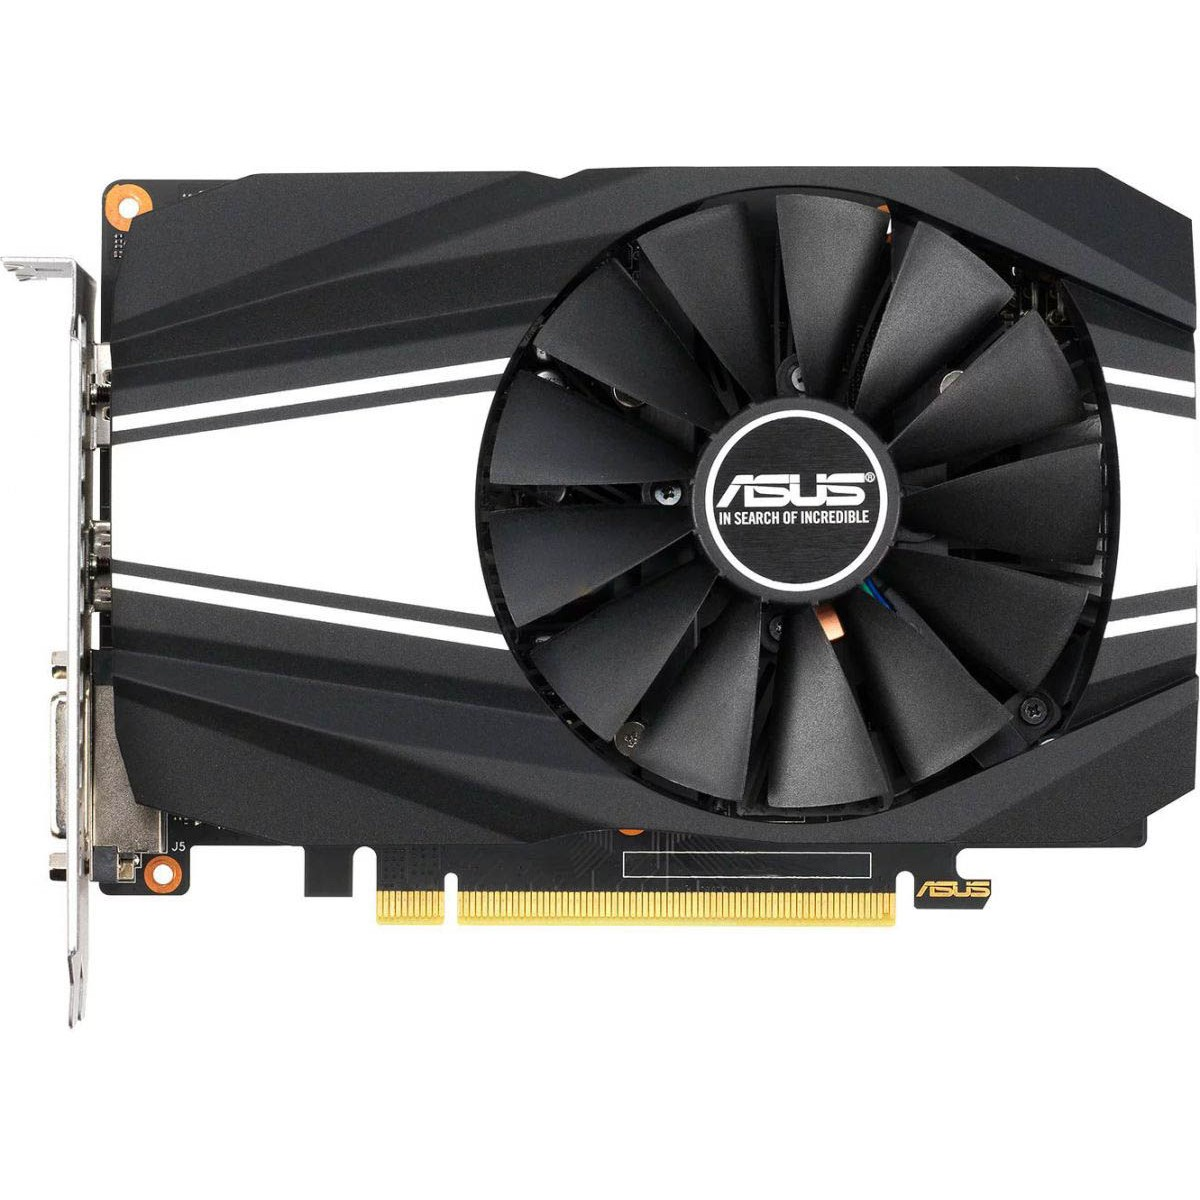 Placa de Vídeo Asus Phoenix GeForce GTX 1660 Super OC, 6GB GDDR6, 192Bit, PH-GTX1660S-O6G